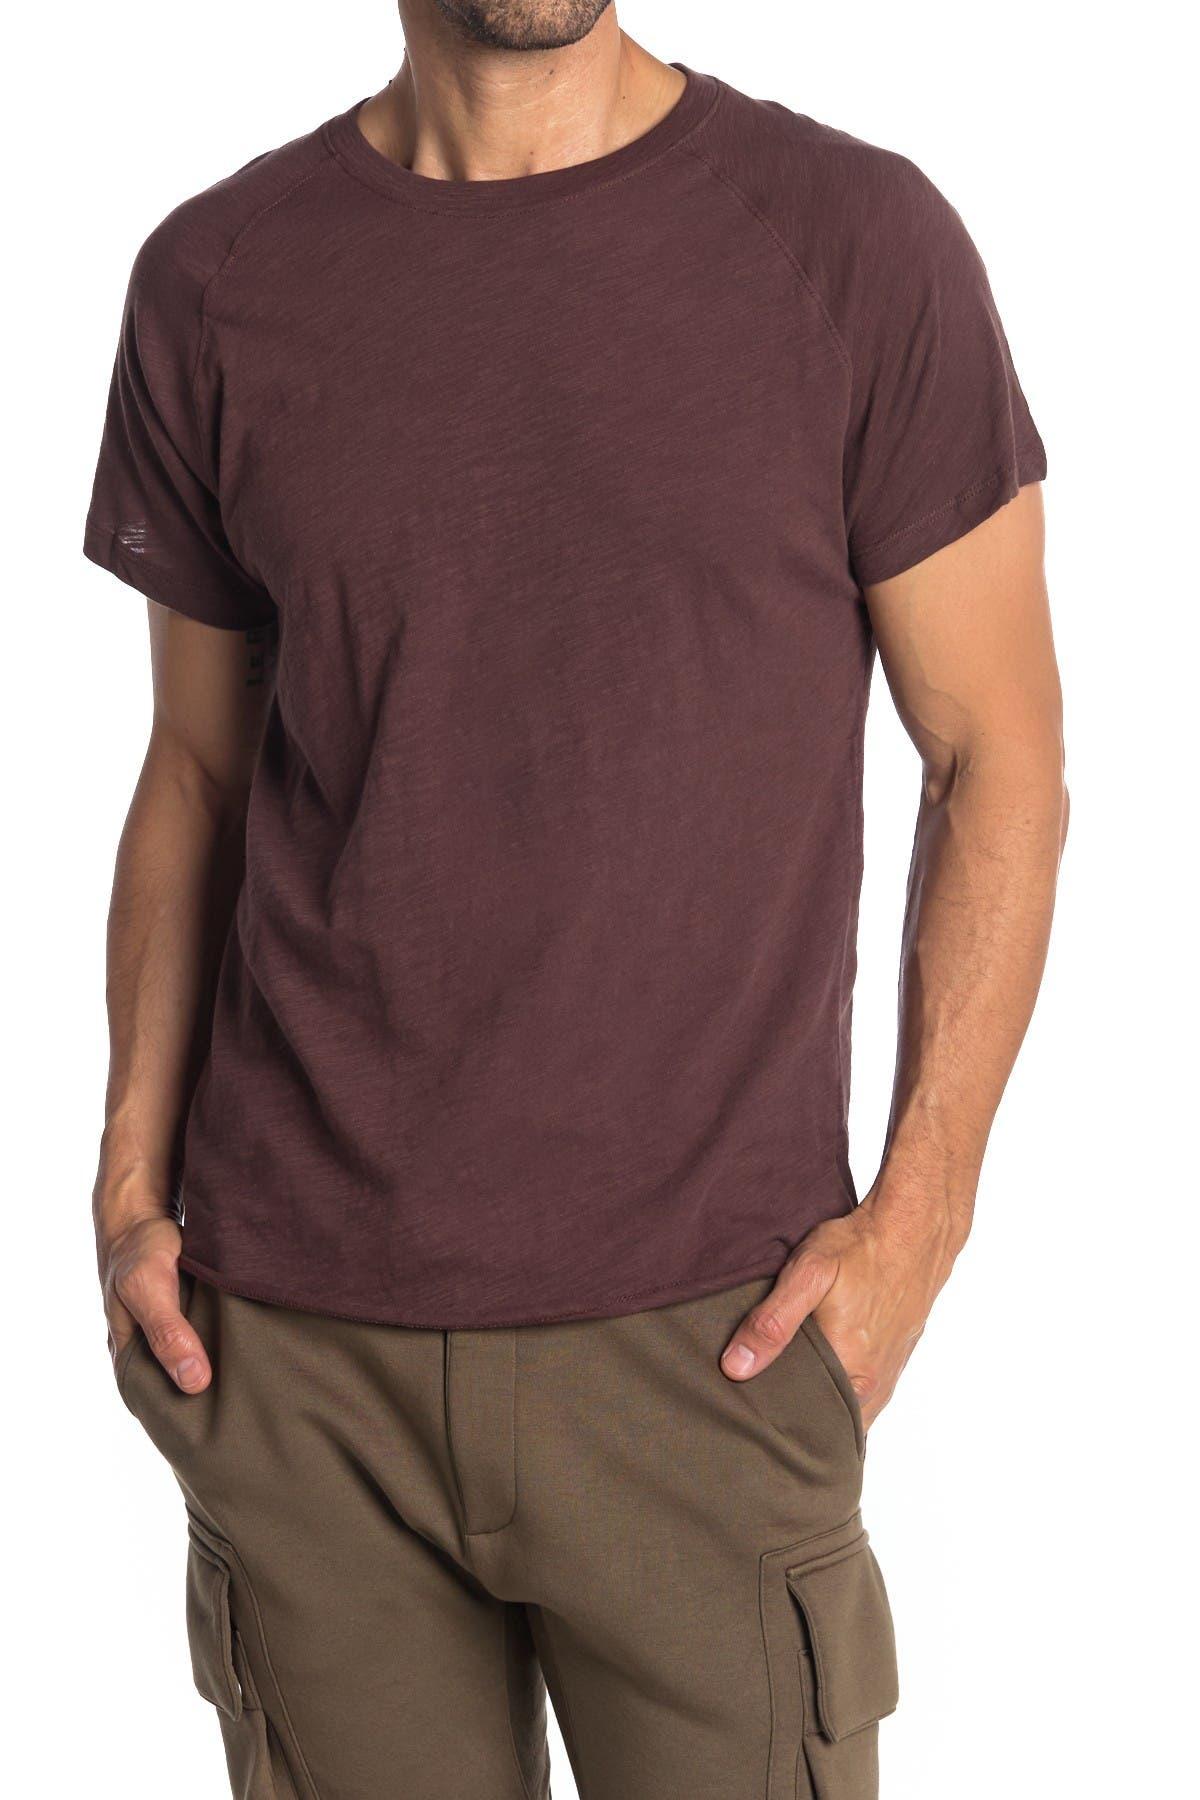 Image of Richer Poorer Raglan Short Sleeve Lounge T-Shirt